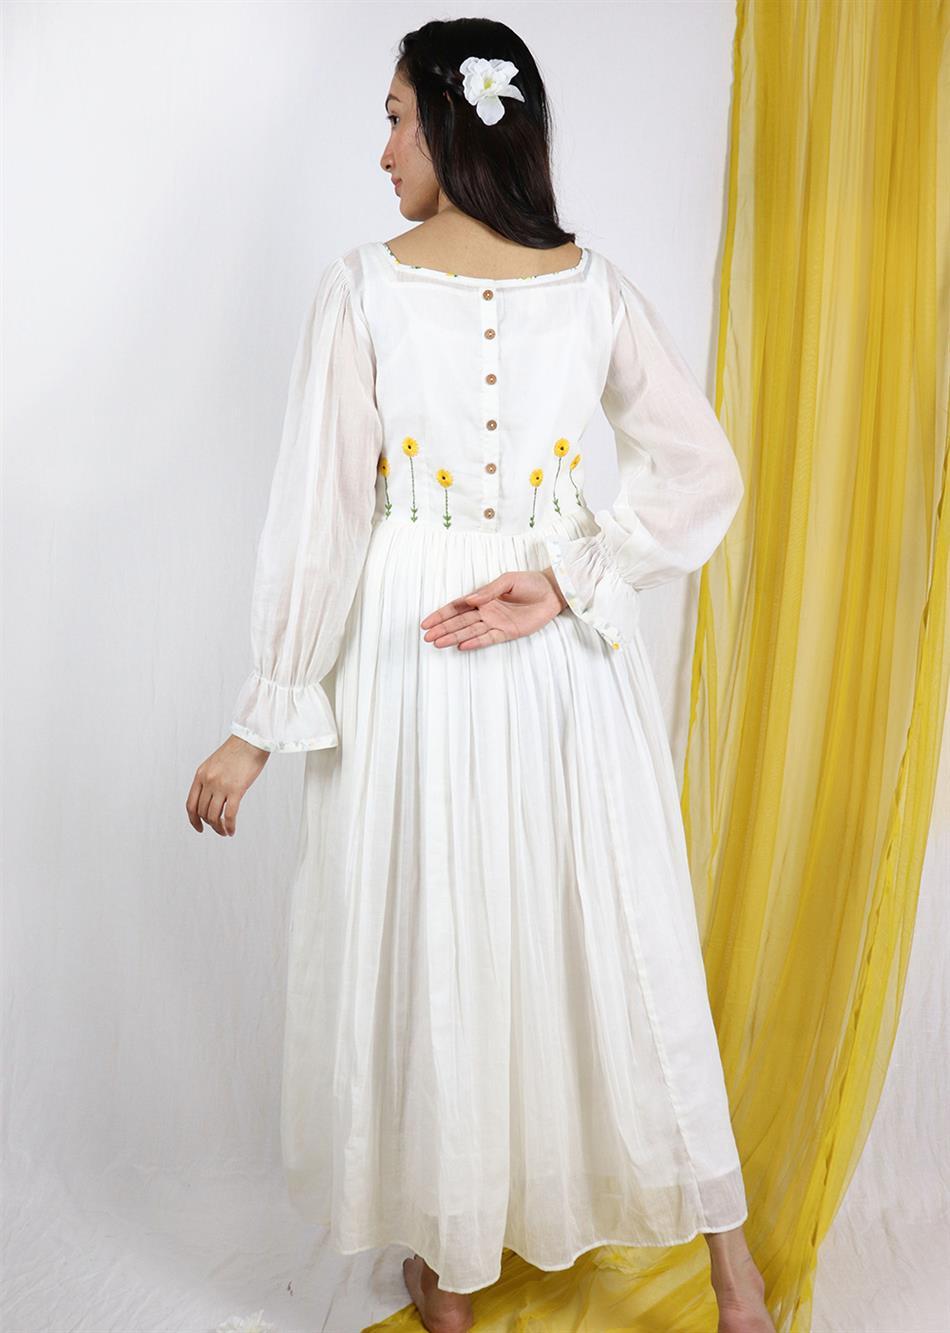 All-White Basantah Midi Dress By Jovi Fashion